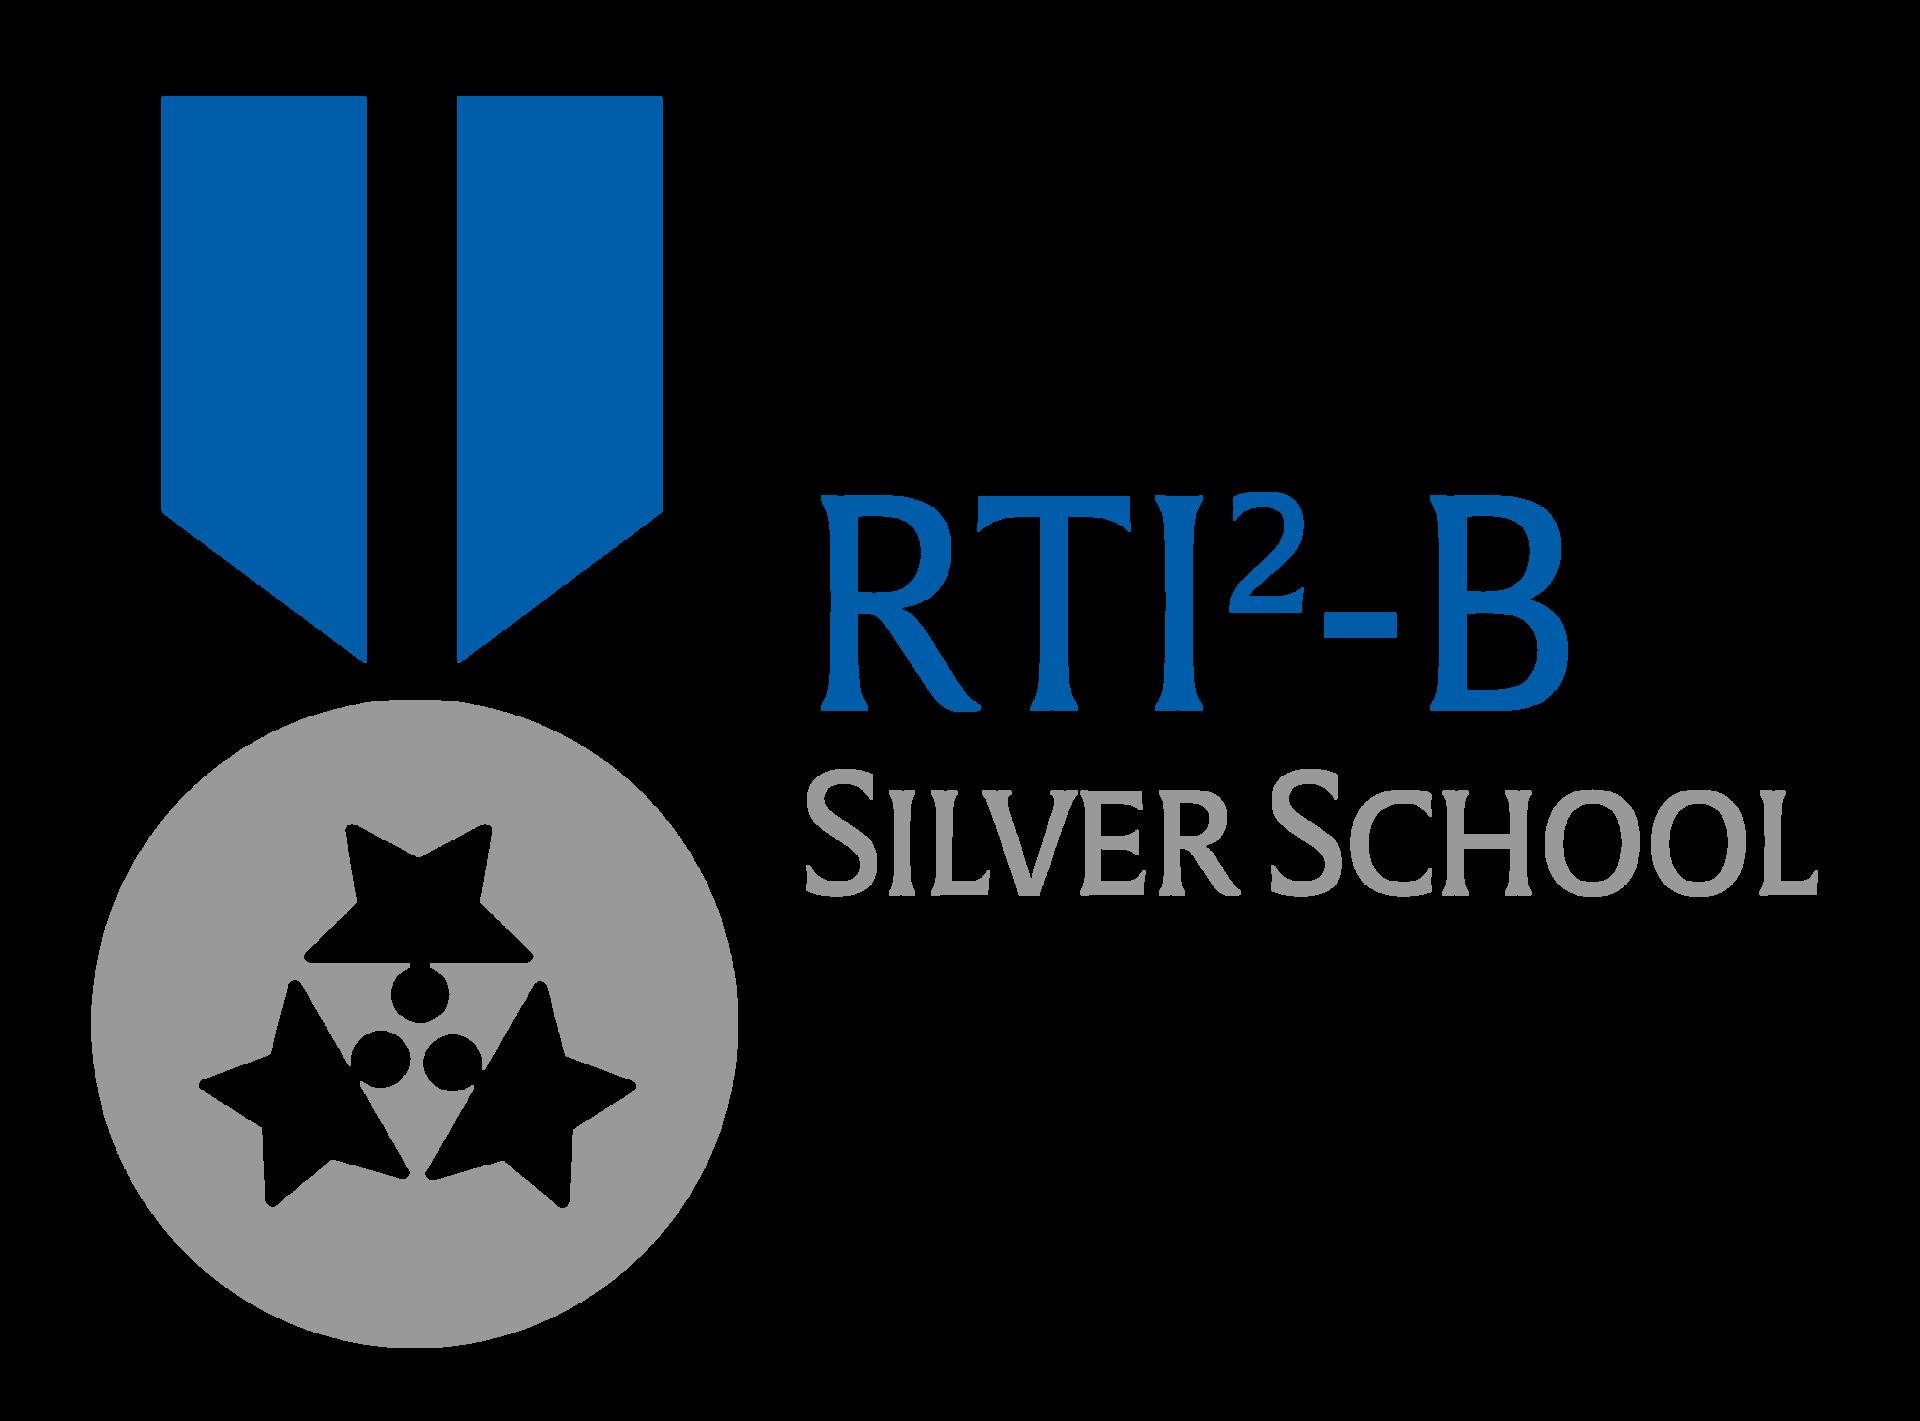 RTI2B SILVER